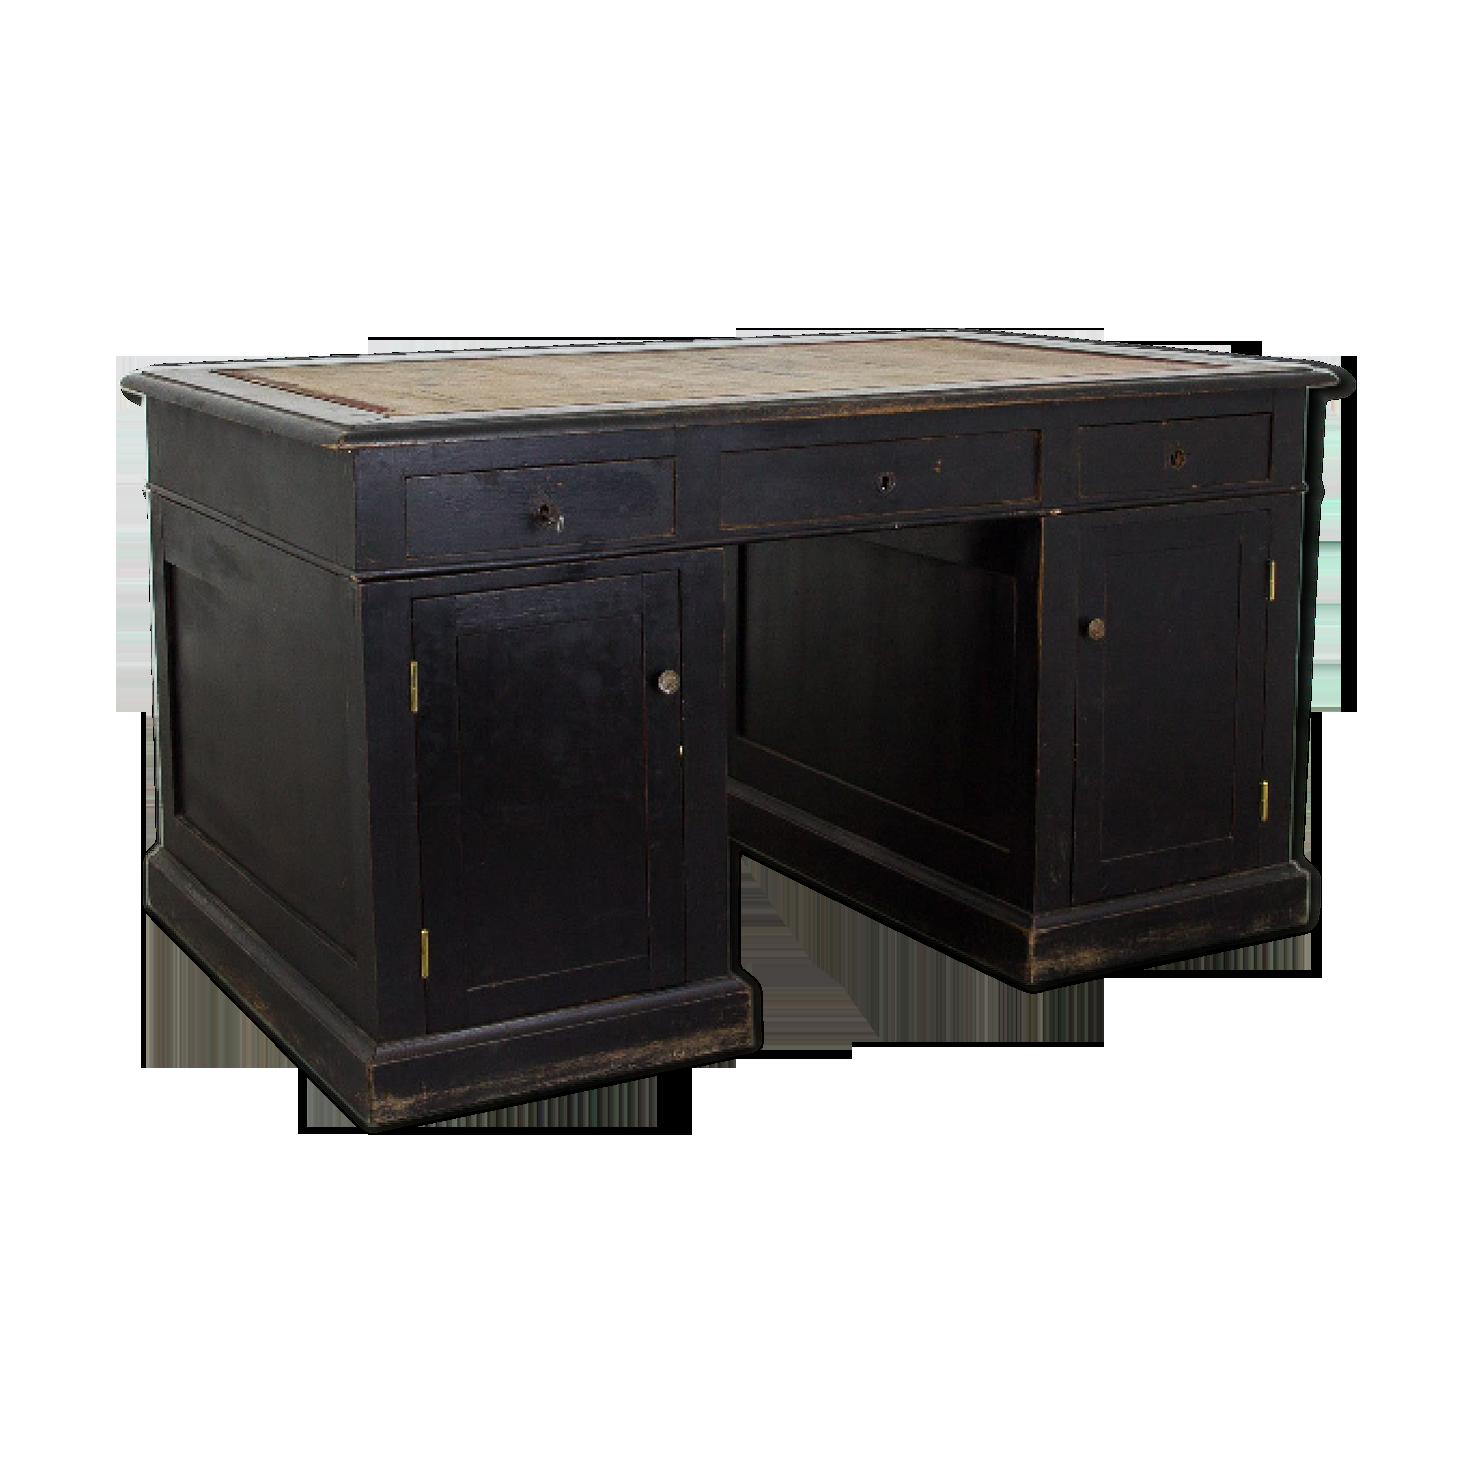 Bureau noir avec tiroirs fin xixe siècle bois matériau